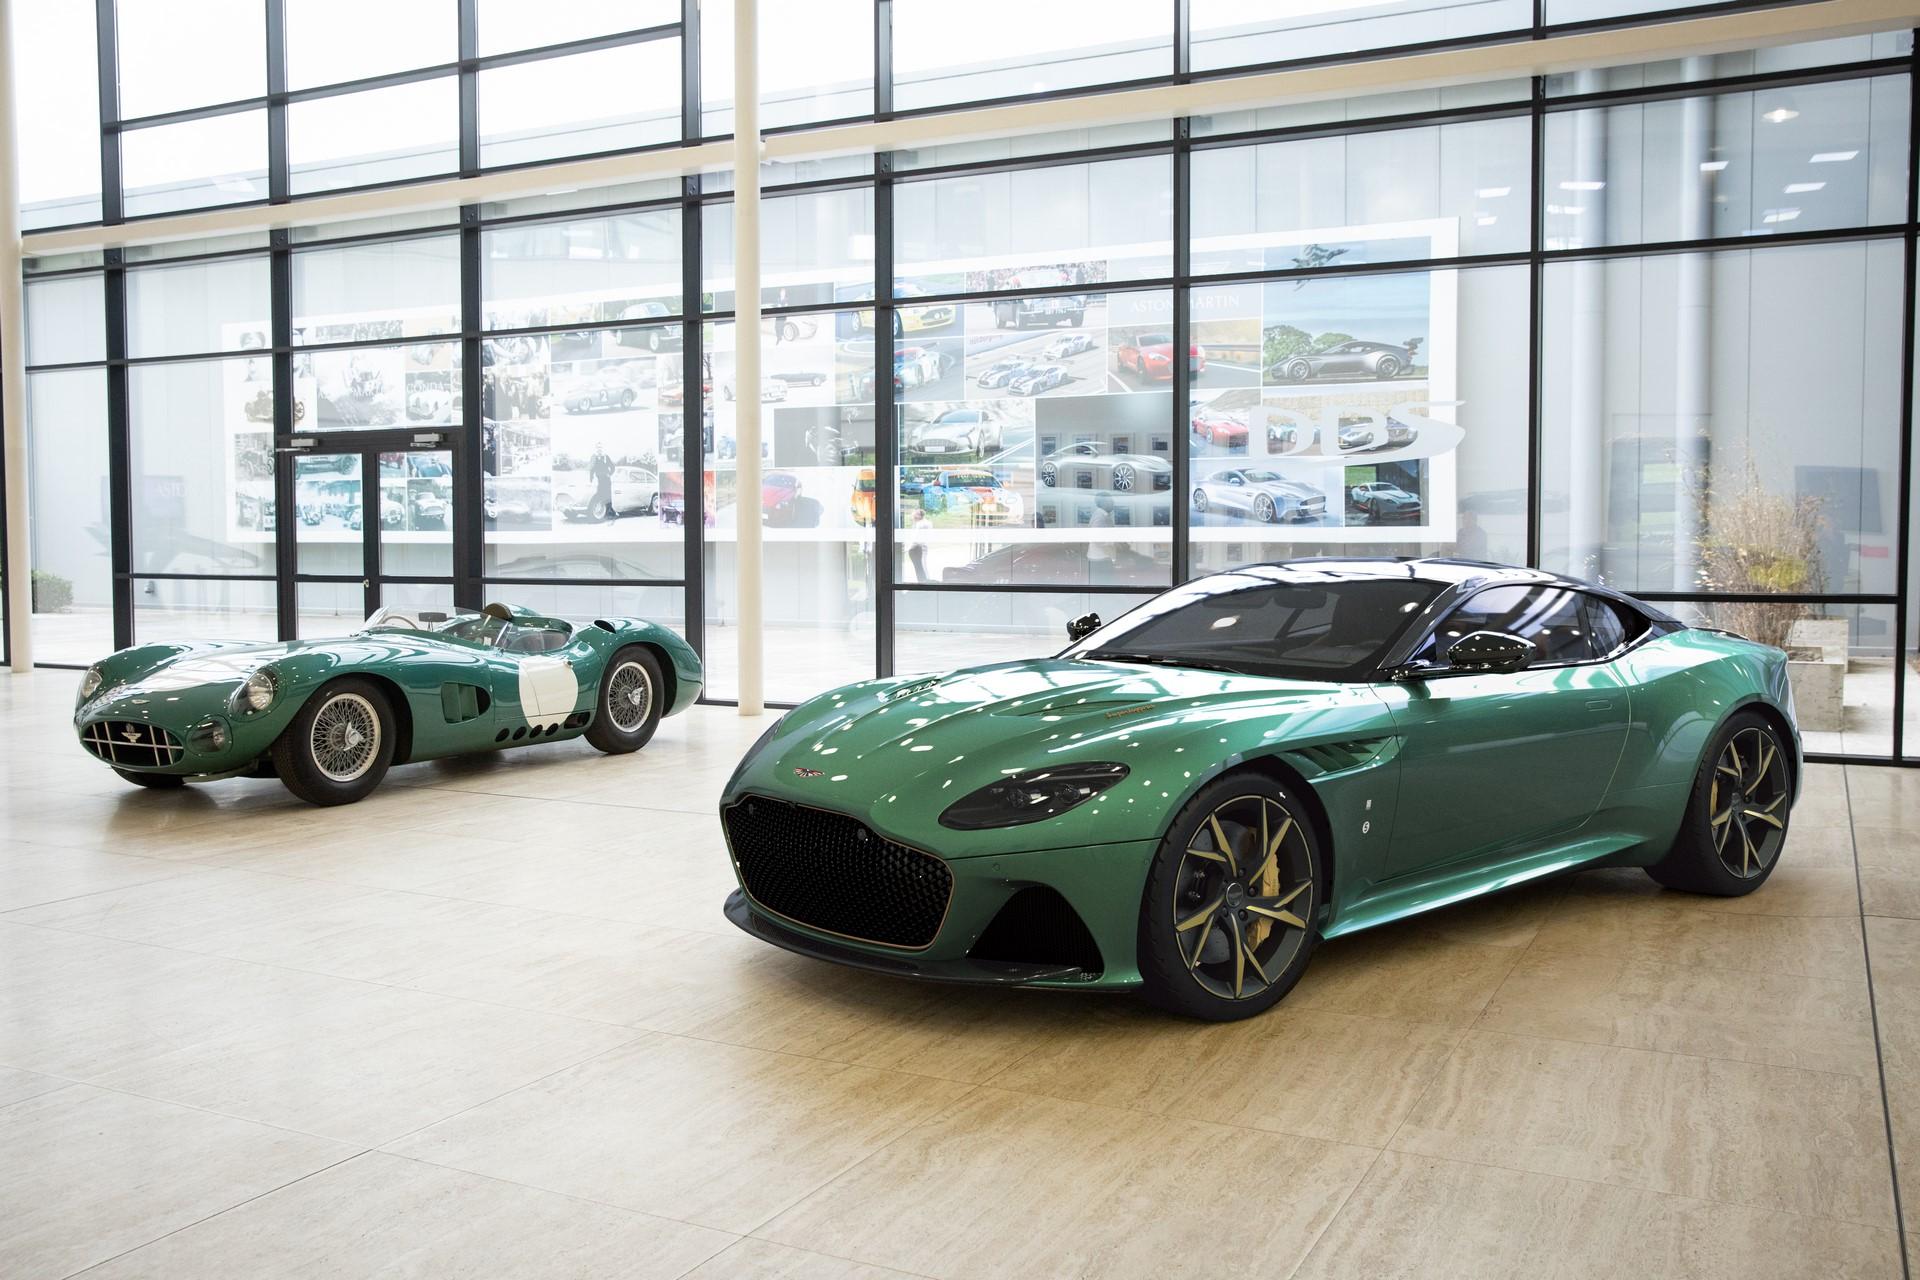 Aston Martin DBS 59 (6)